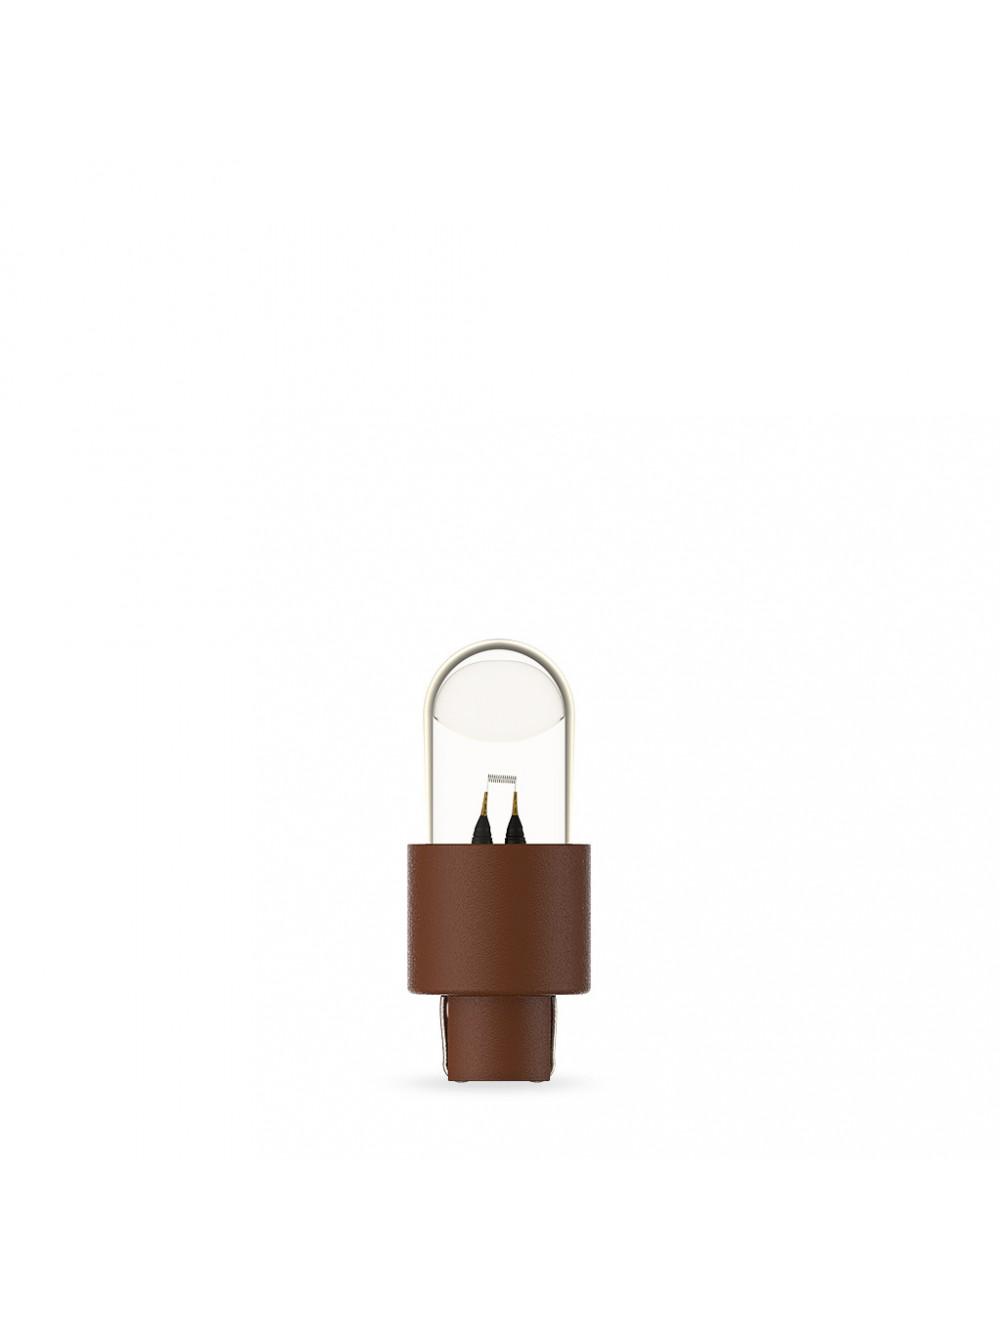 Das Produkt MK-dent Xenon Lampe BU7012SG aus dem Global-dent online shop.